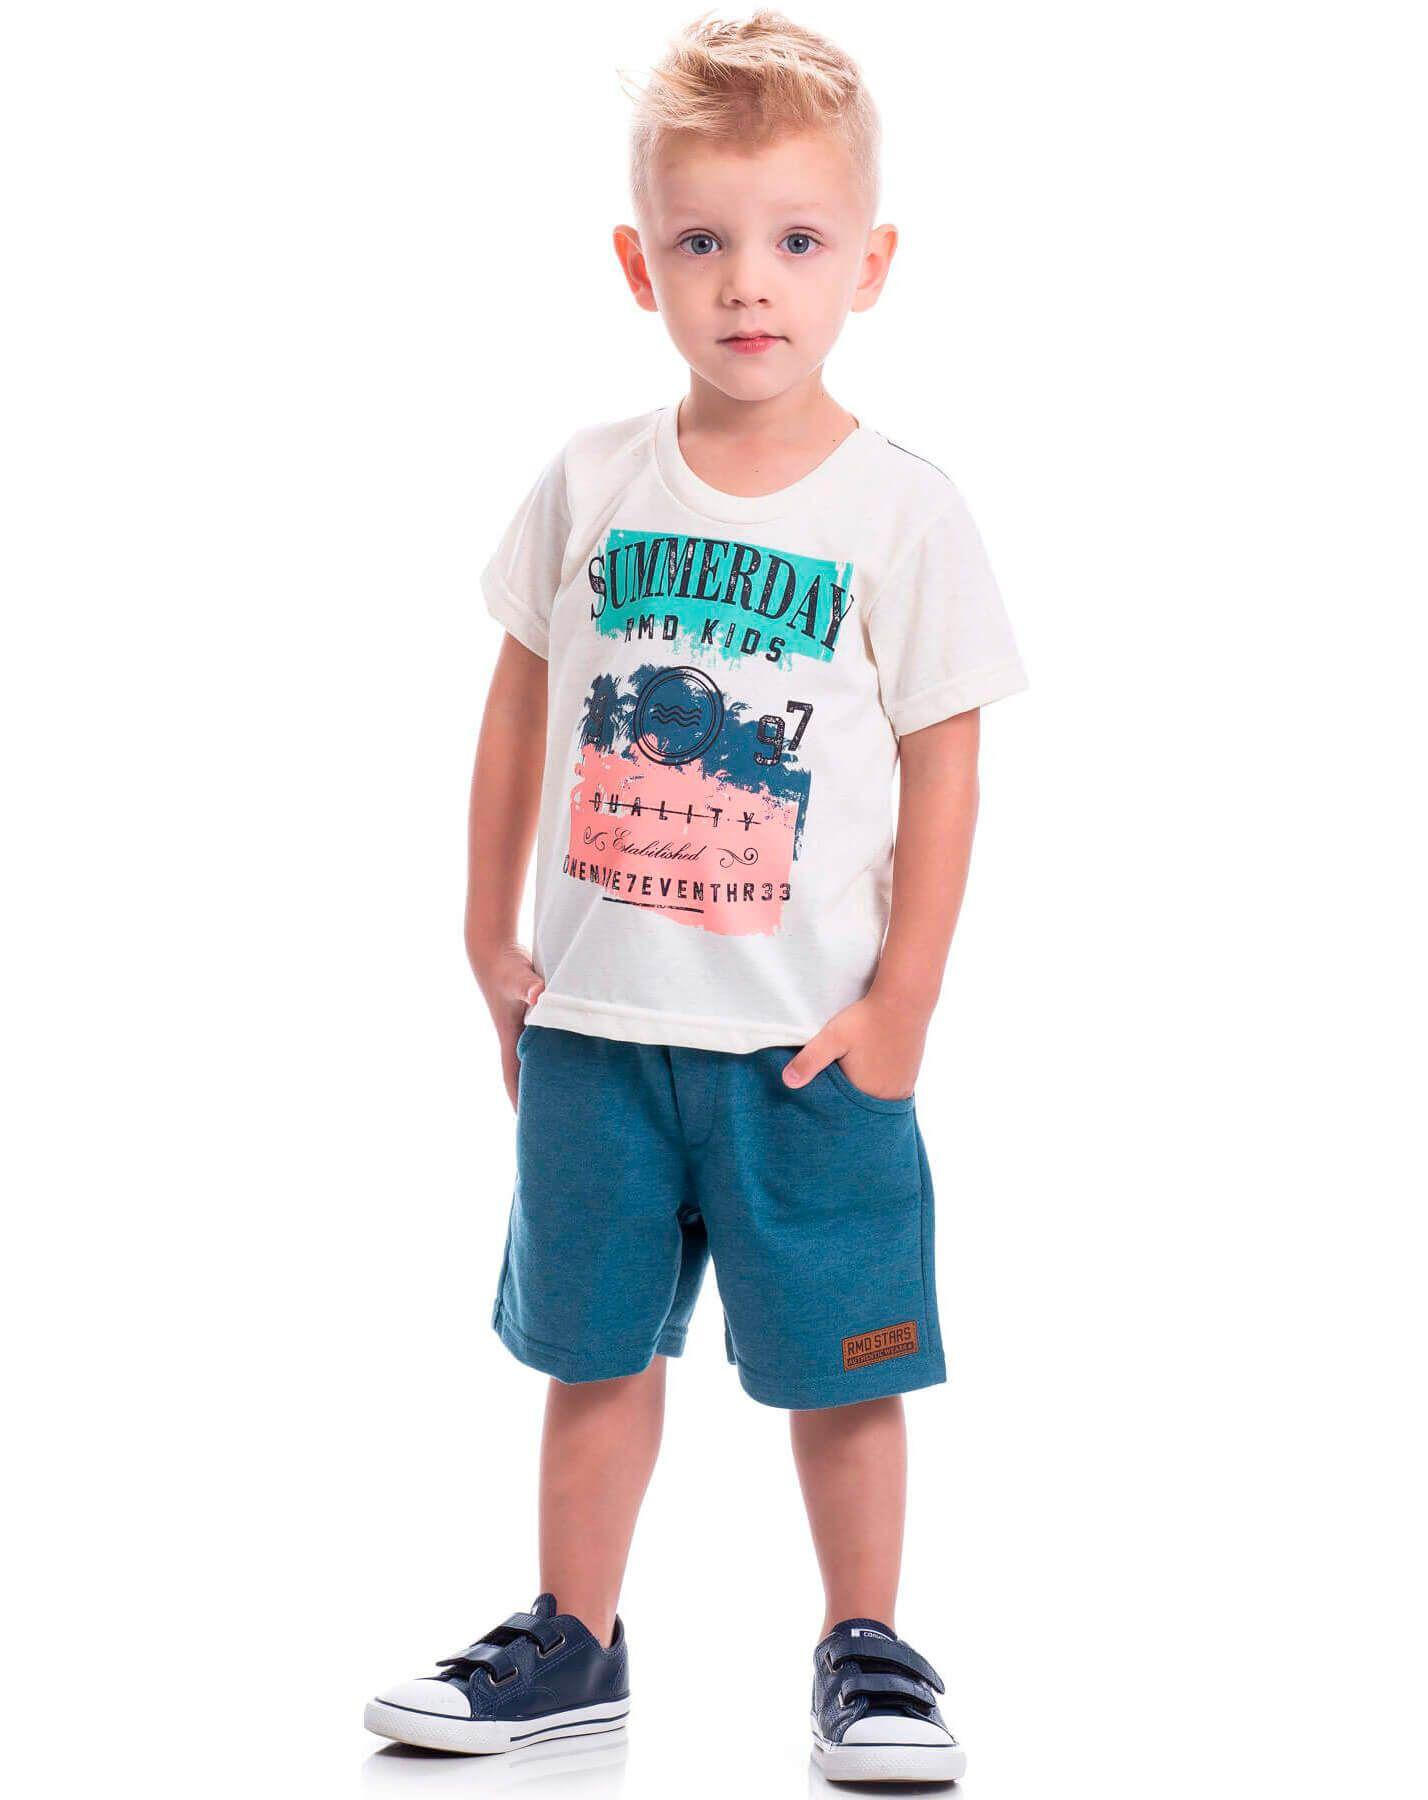 Conjunto Infantil Randa Mundu Camiseta Short